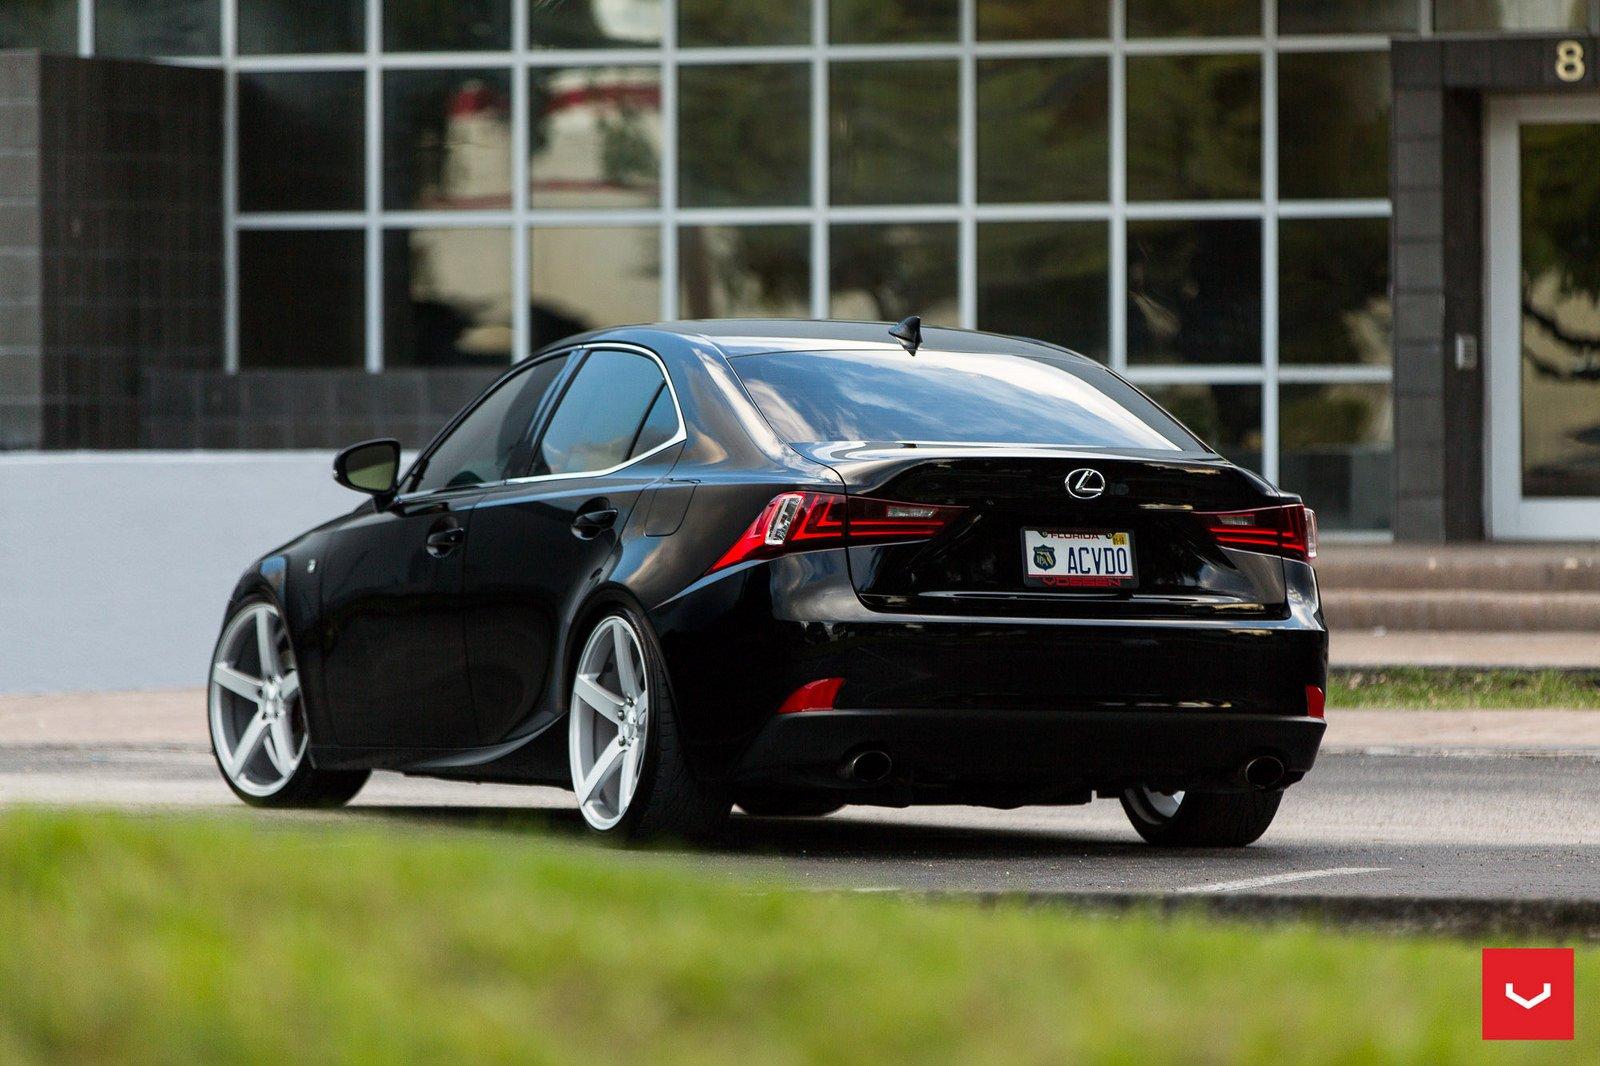 Lexus IS 250 FSport black Vossen Wheels cars wallpaper